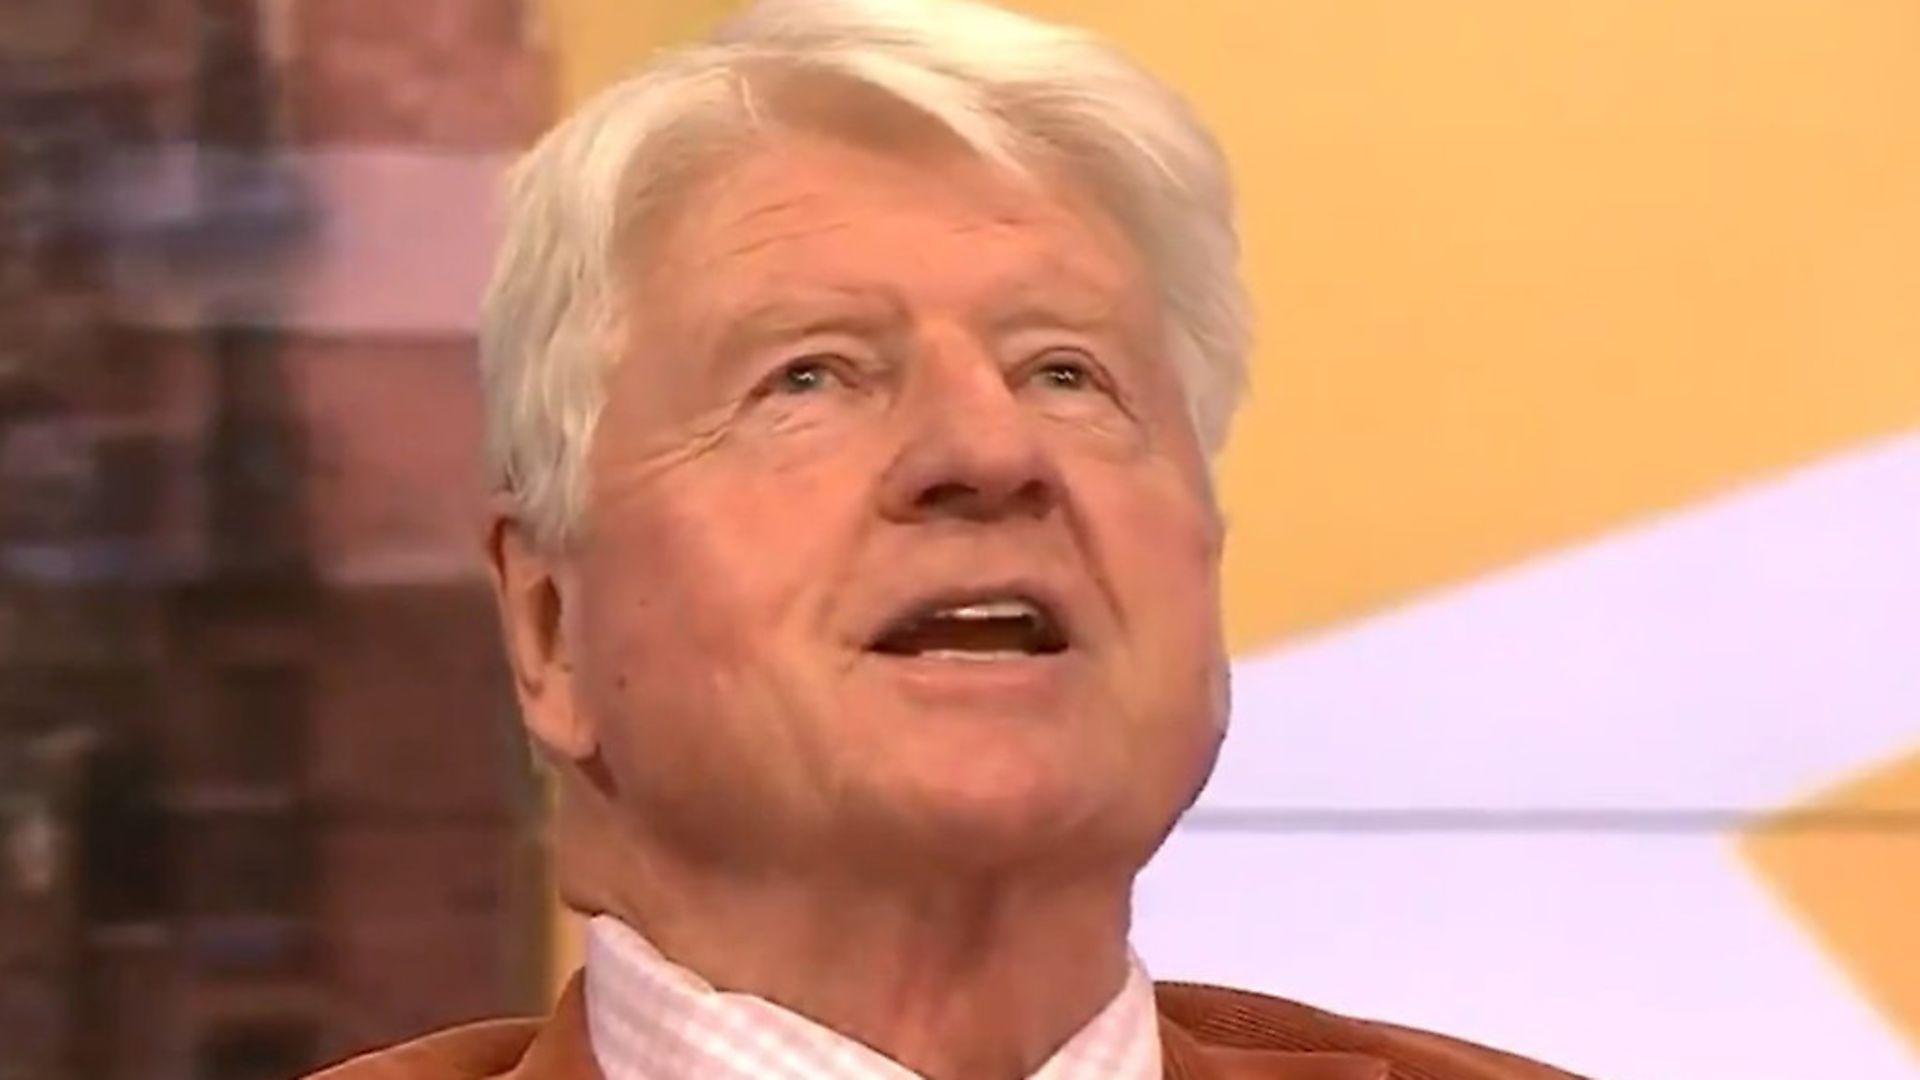 Boris Johnson's father Stanley Johnson. Photograph: BBC. - Credit: BBC